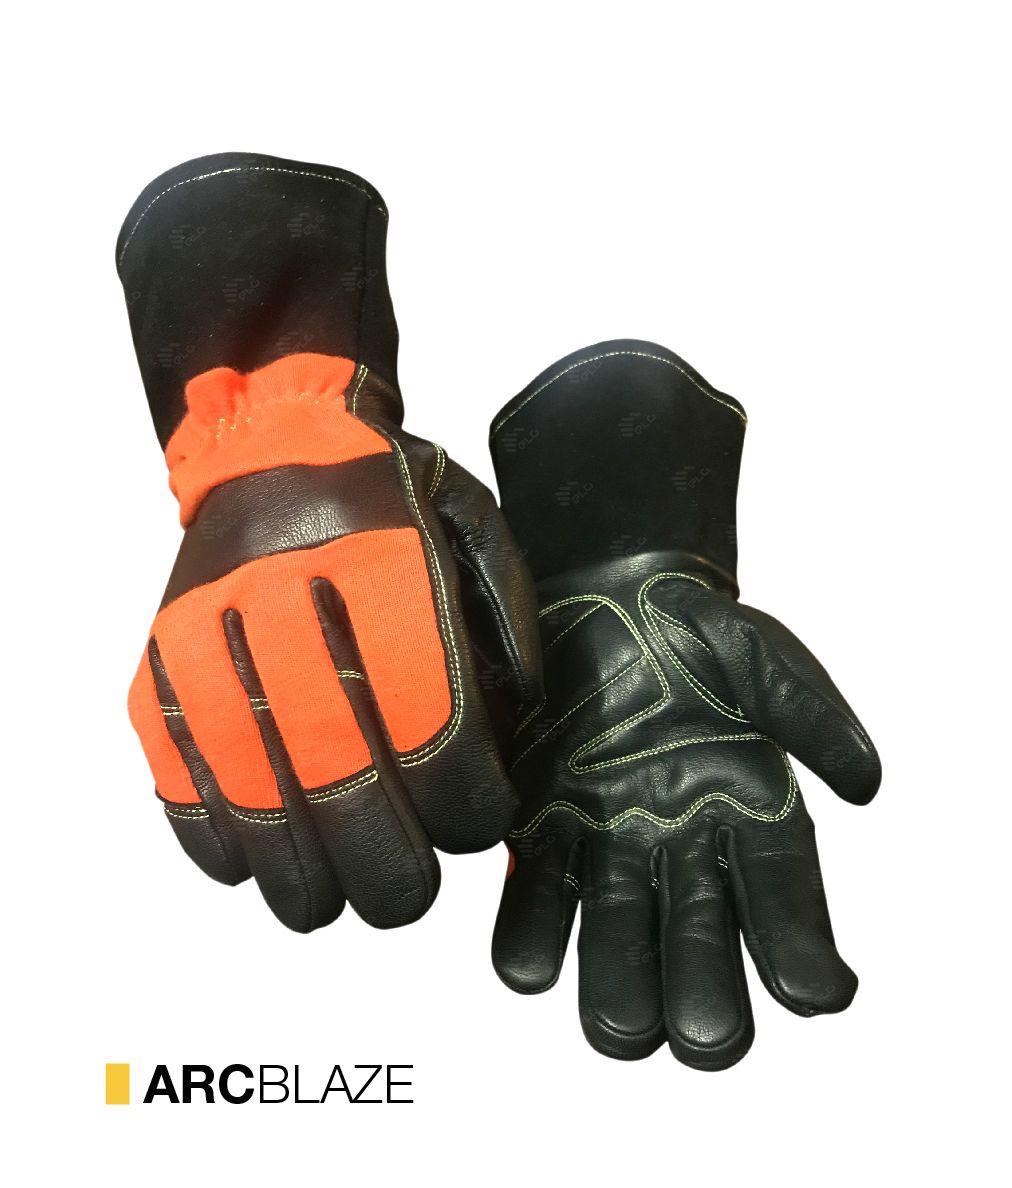 ArcBlaze cut-resistant gloves by elite leather